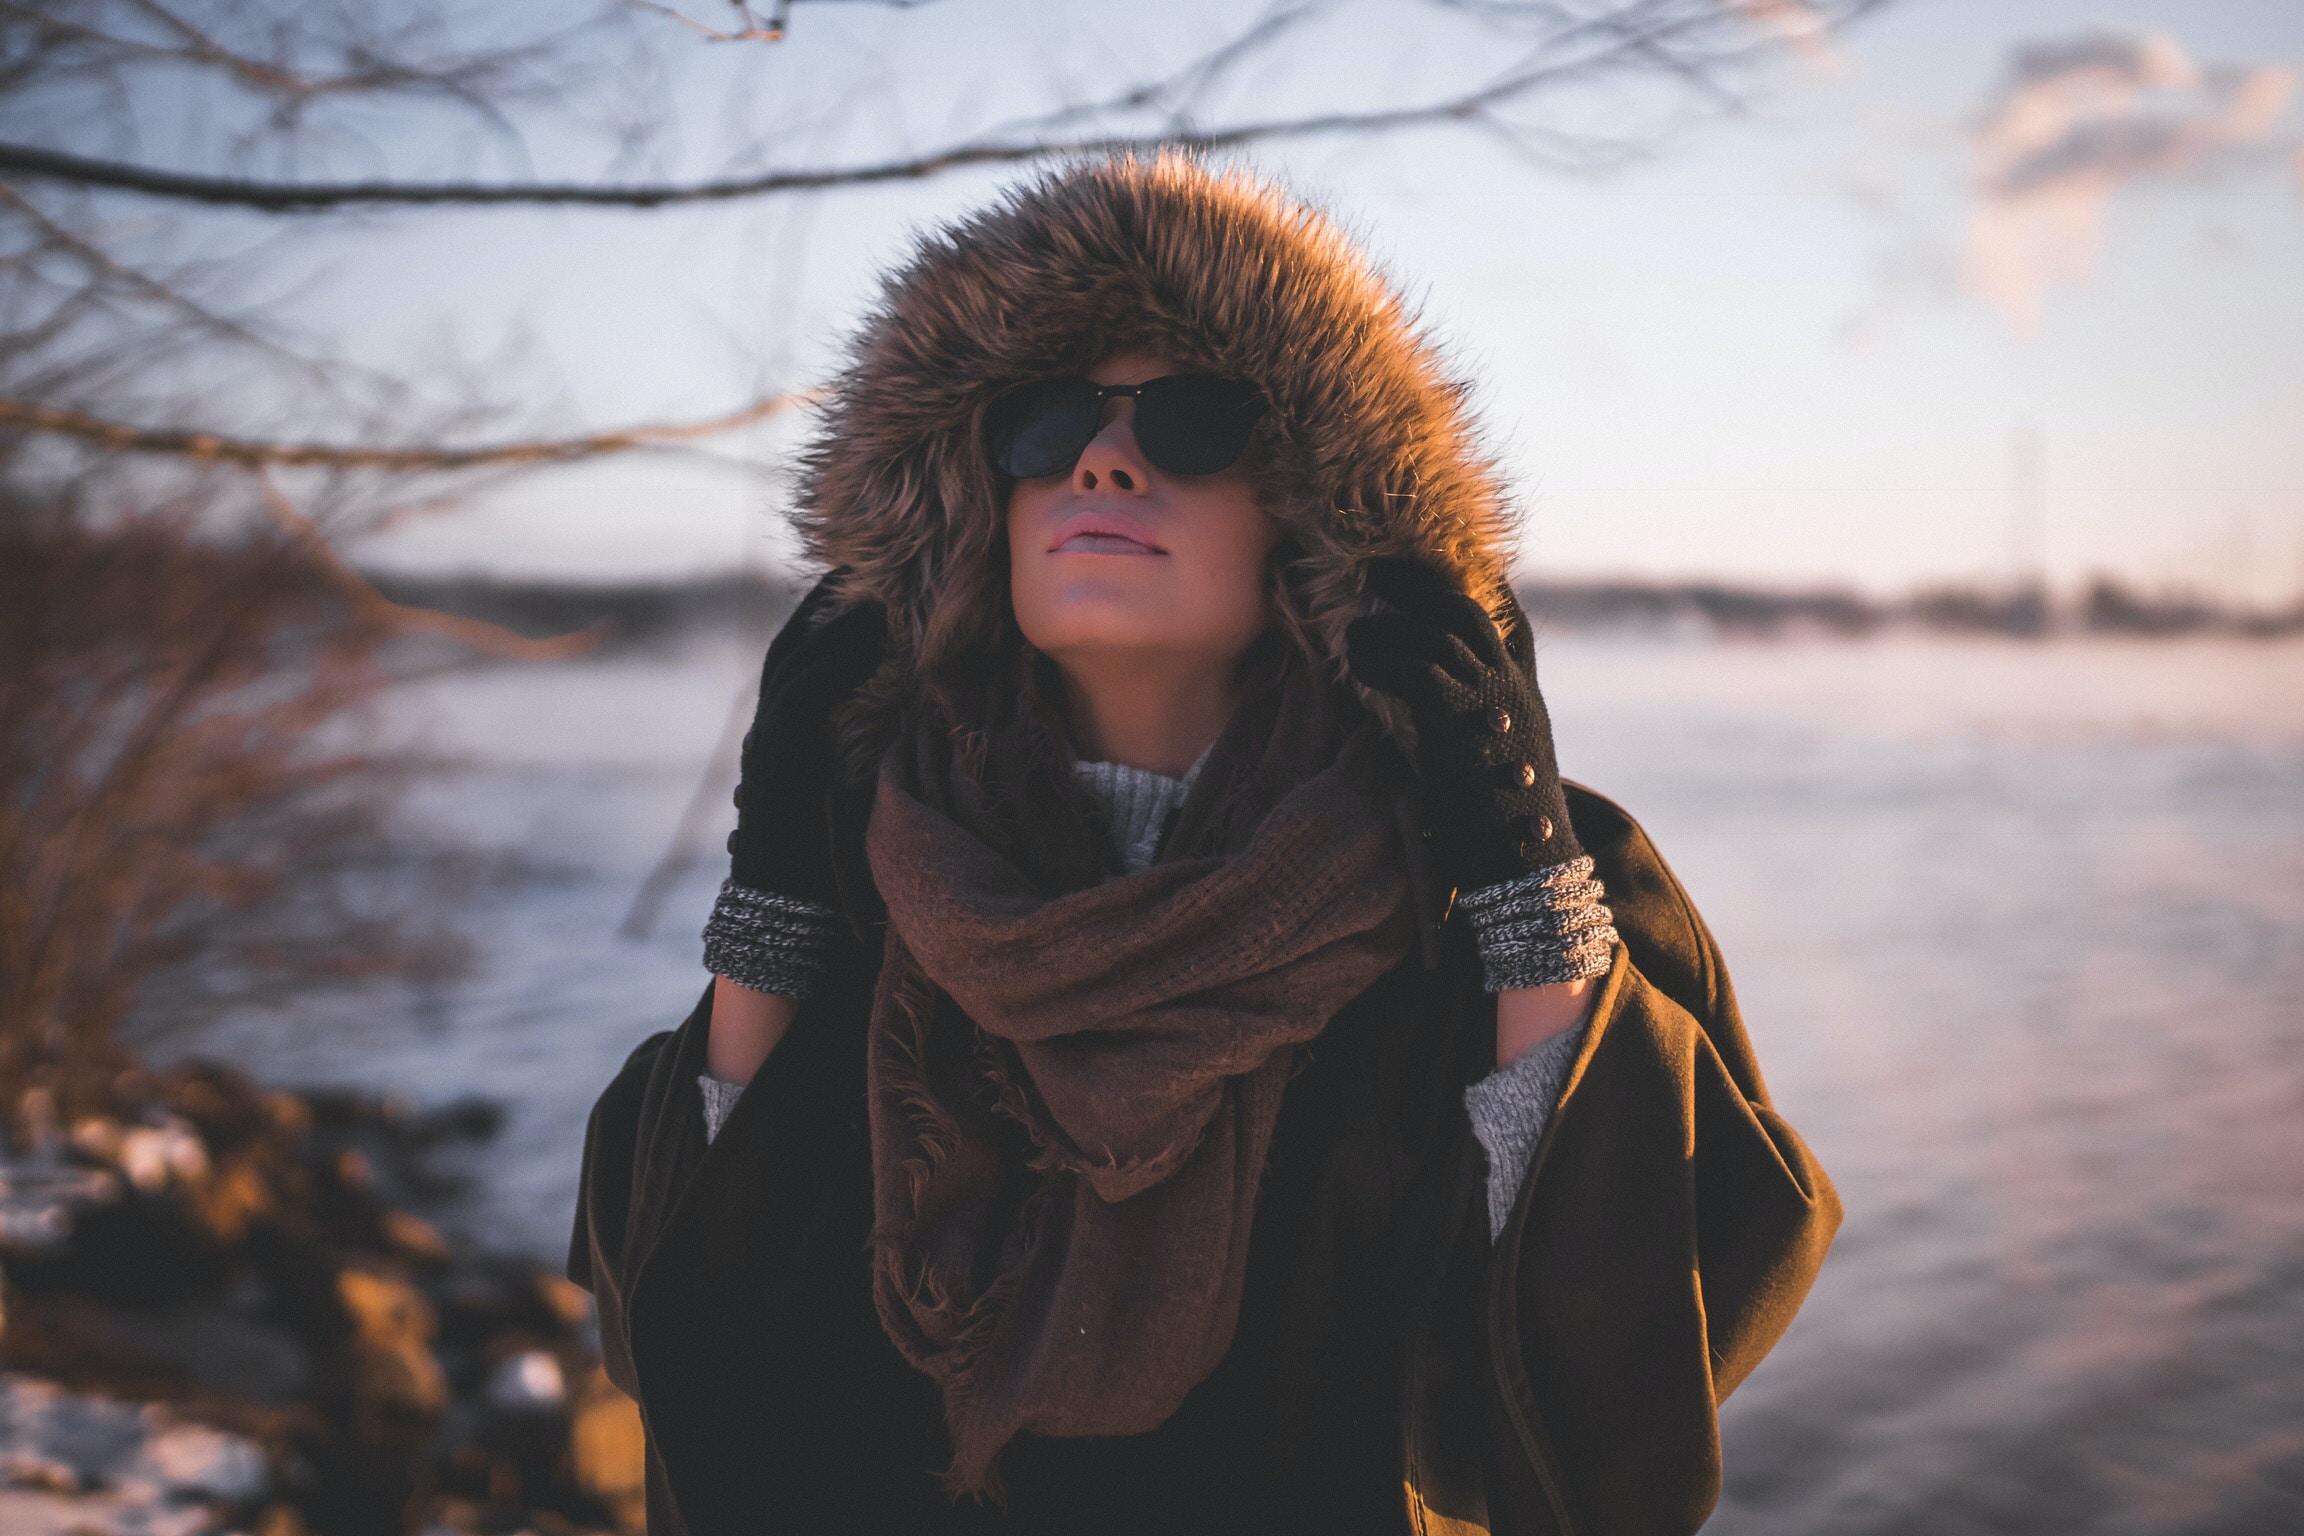 woman wearing fur hoodie near water